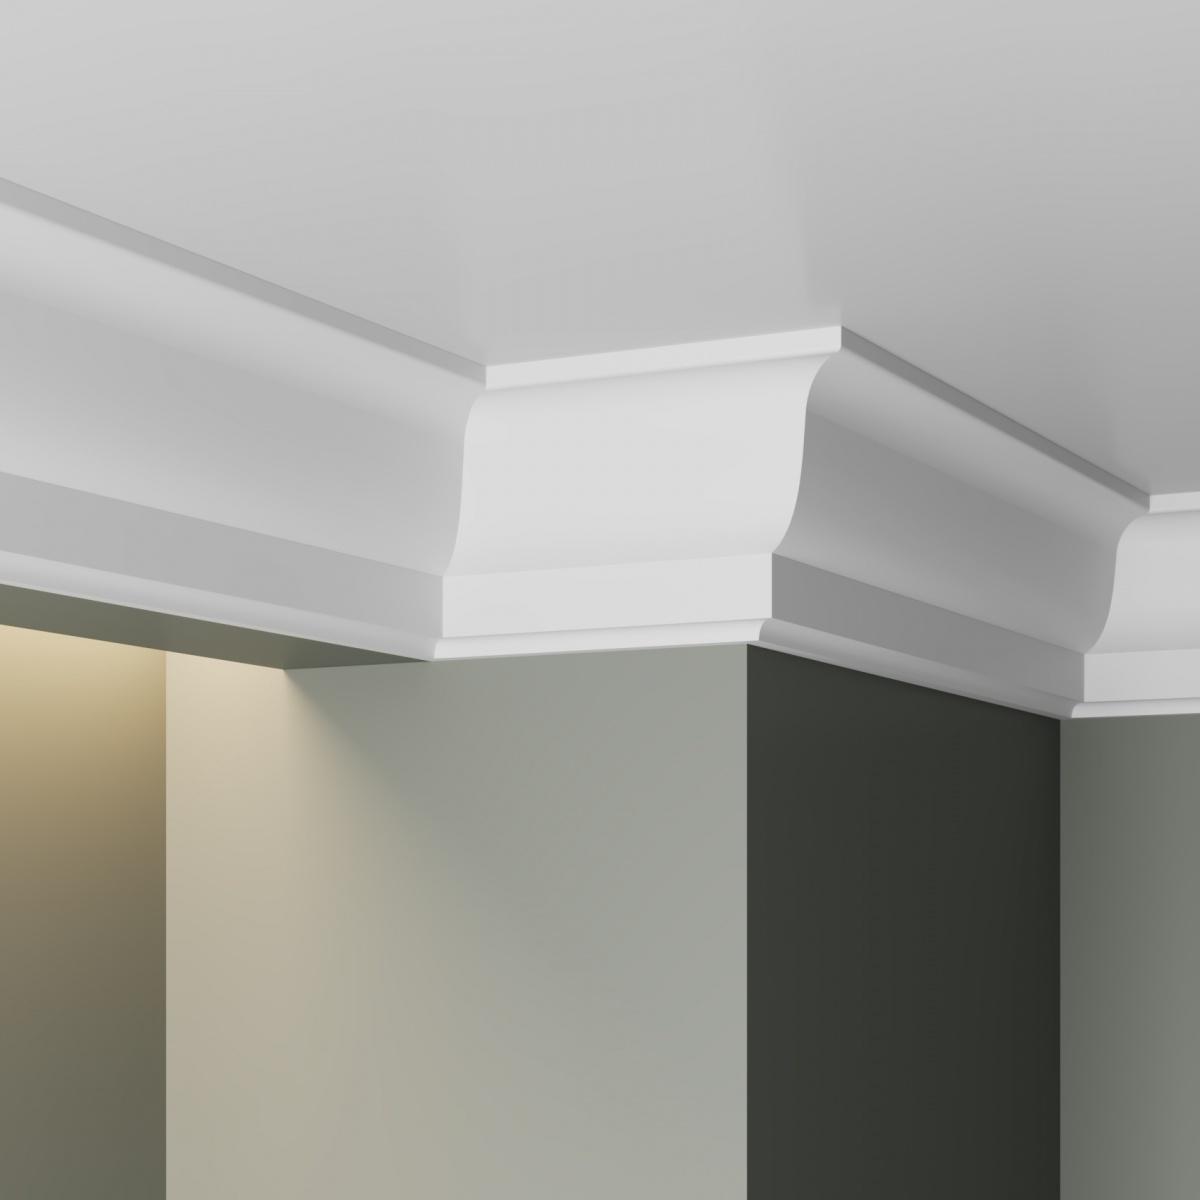 потолки с широкими плинтусами фото